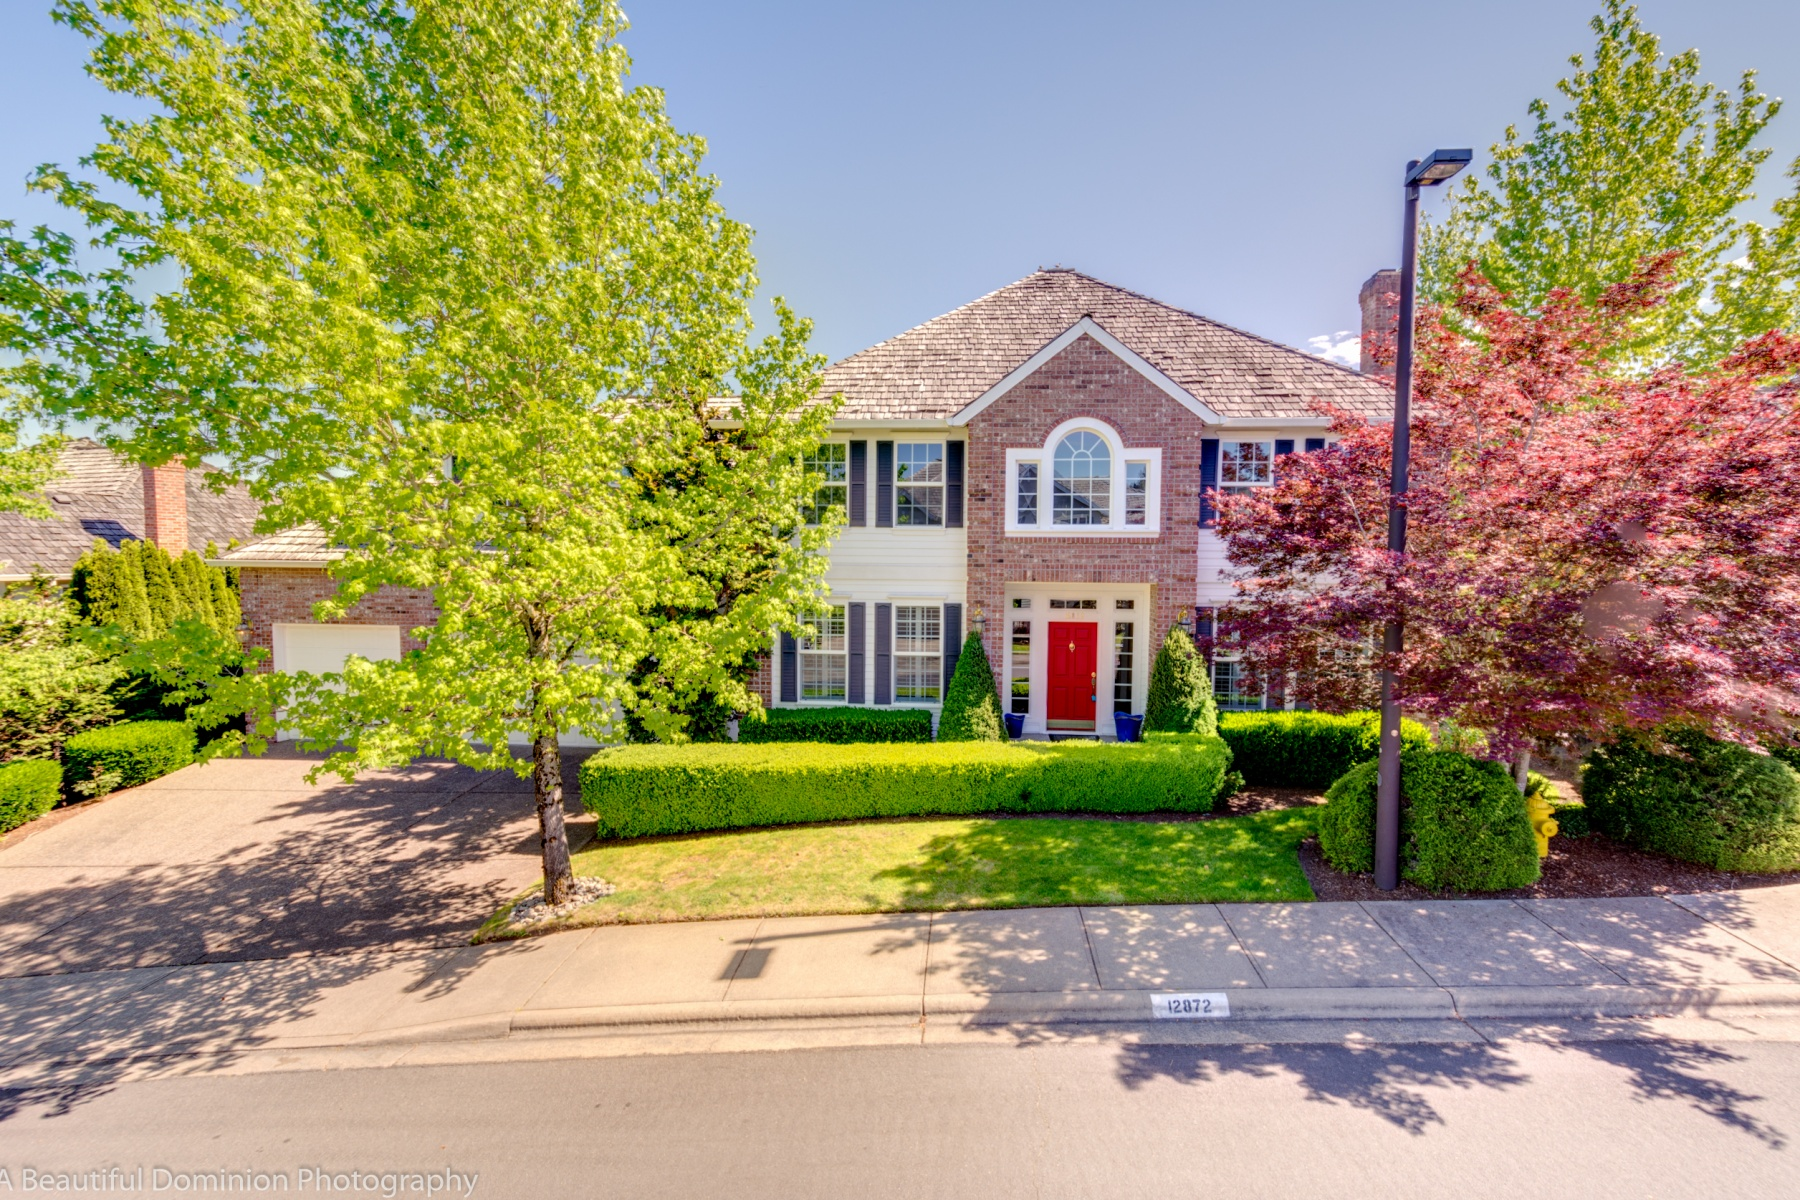 独户住宅 为 销售 在 12872 NW LILYWOOD, PORTLAND 12872 NW LILYWOOD Dr 波特兰, 俄勒冈州, 97229 美国